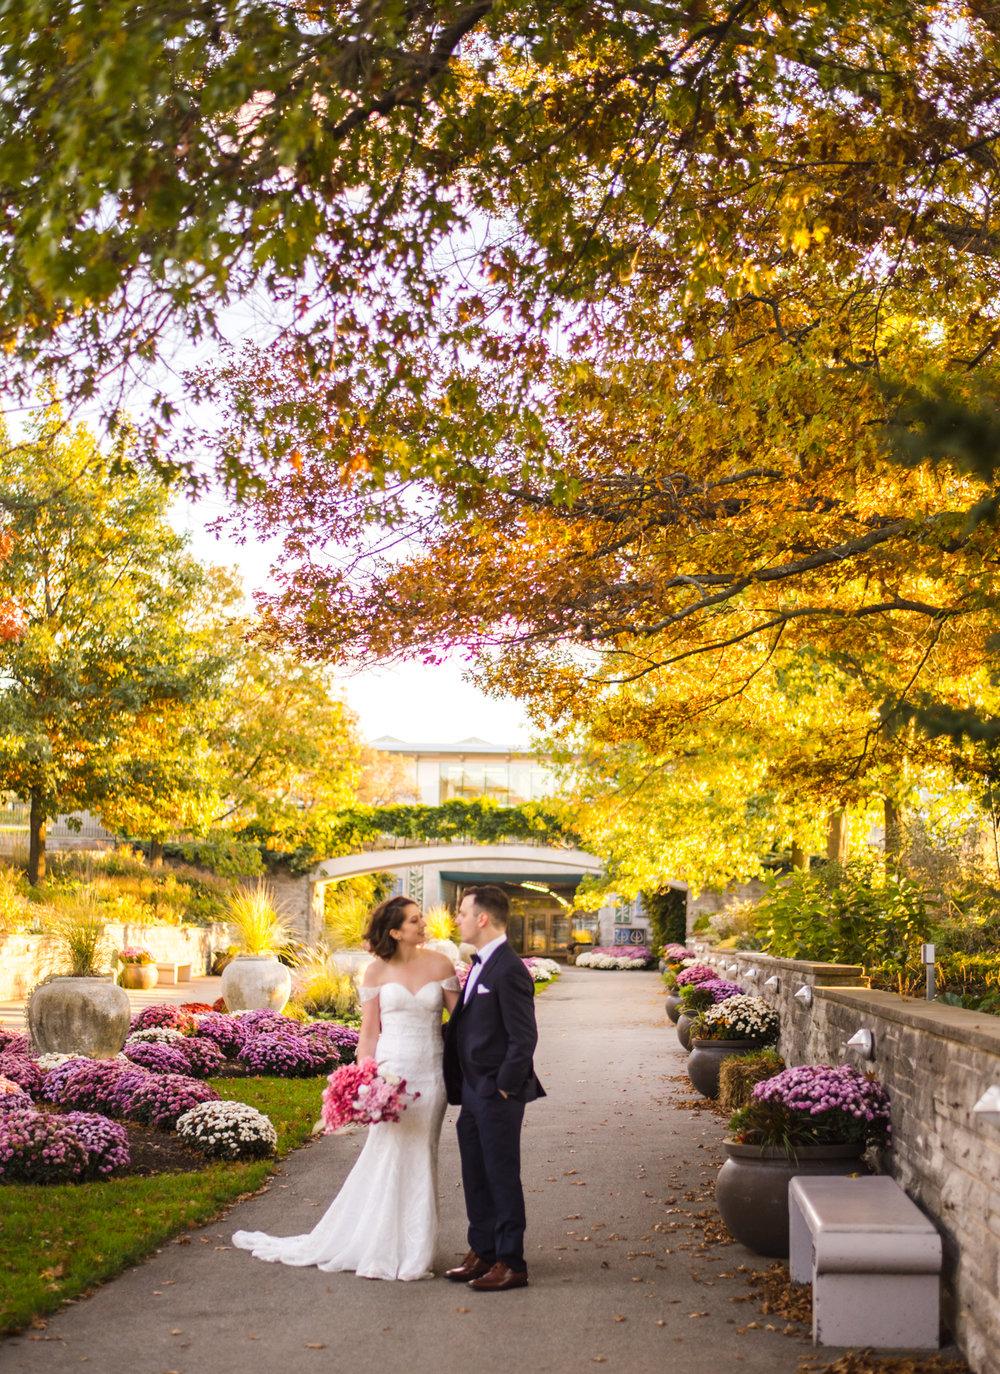 Mike & Allison's Downtown Hamilton RBG Royal Botanical Gardens Wedding Fall Burlington Aidan Hennebry Hush Hush Photography & Film-45.jpg